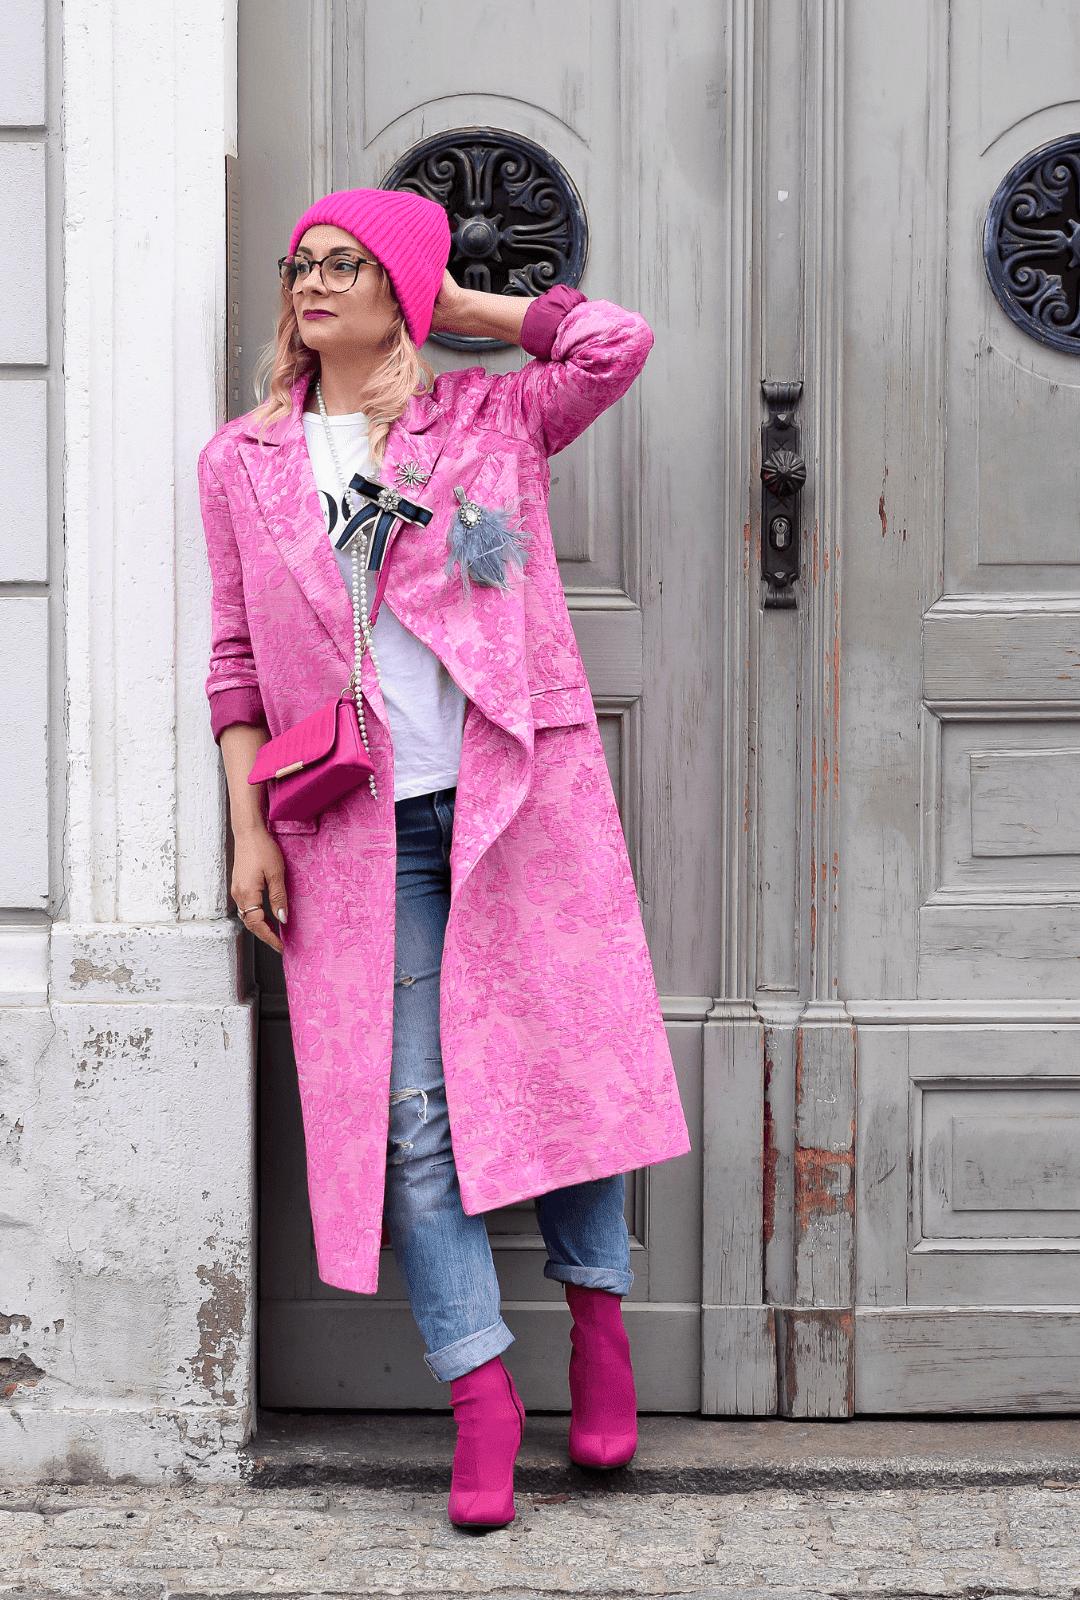 Pink-richtig-kombinieren-outfit-frauen